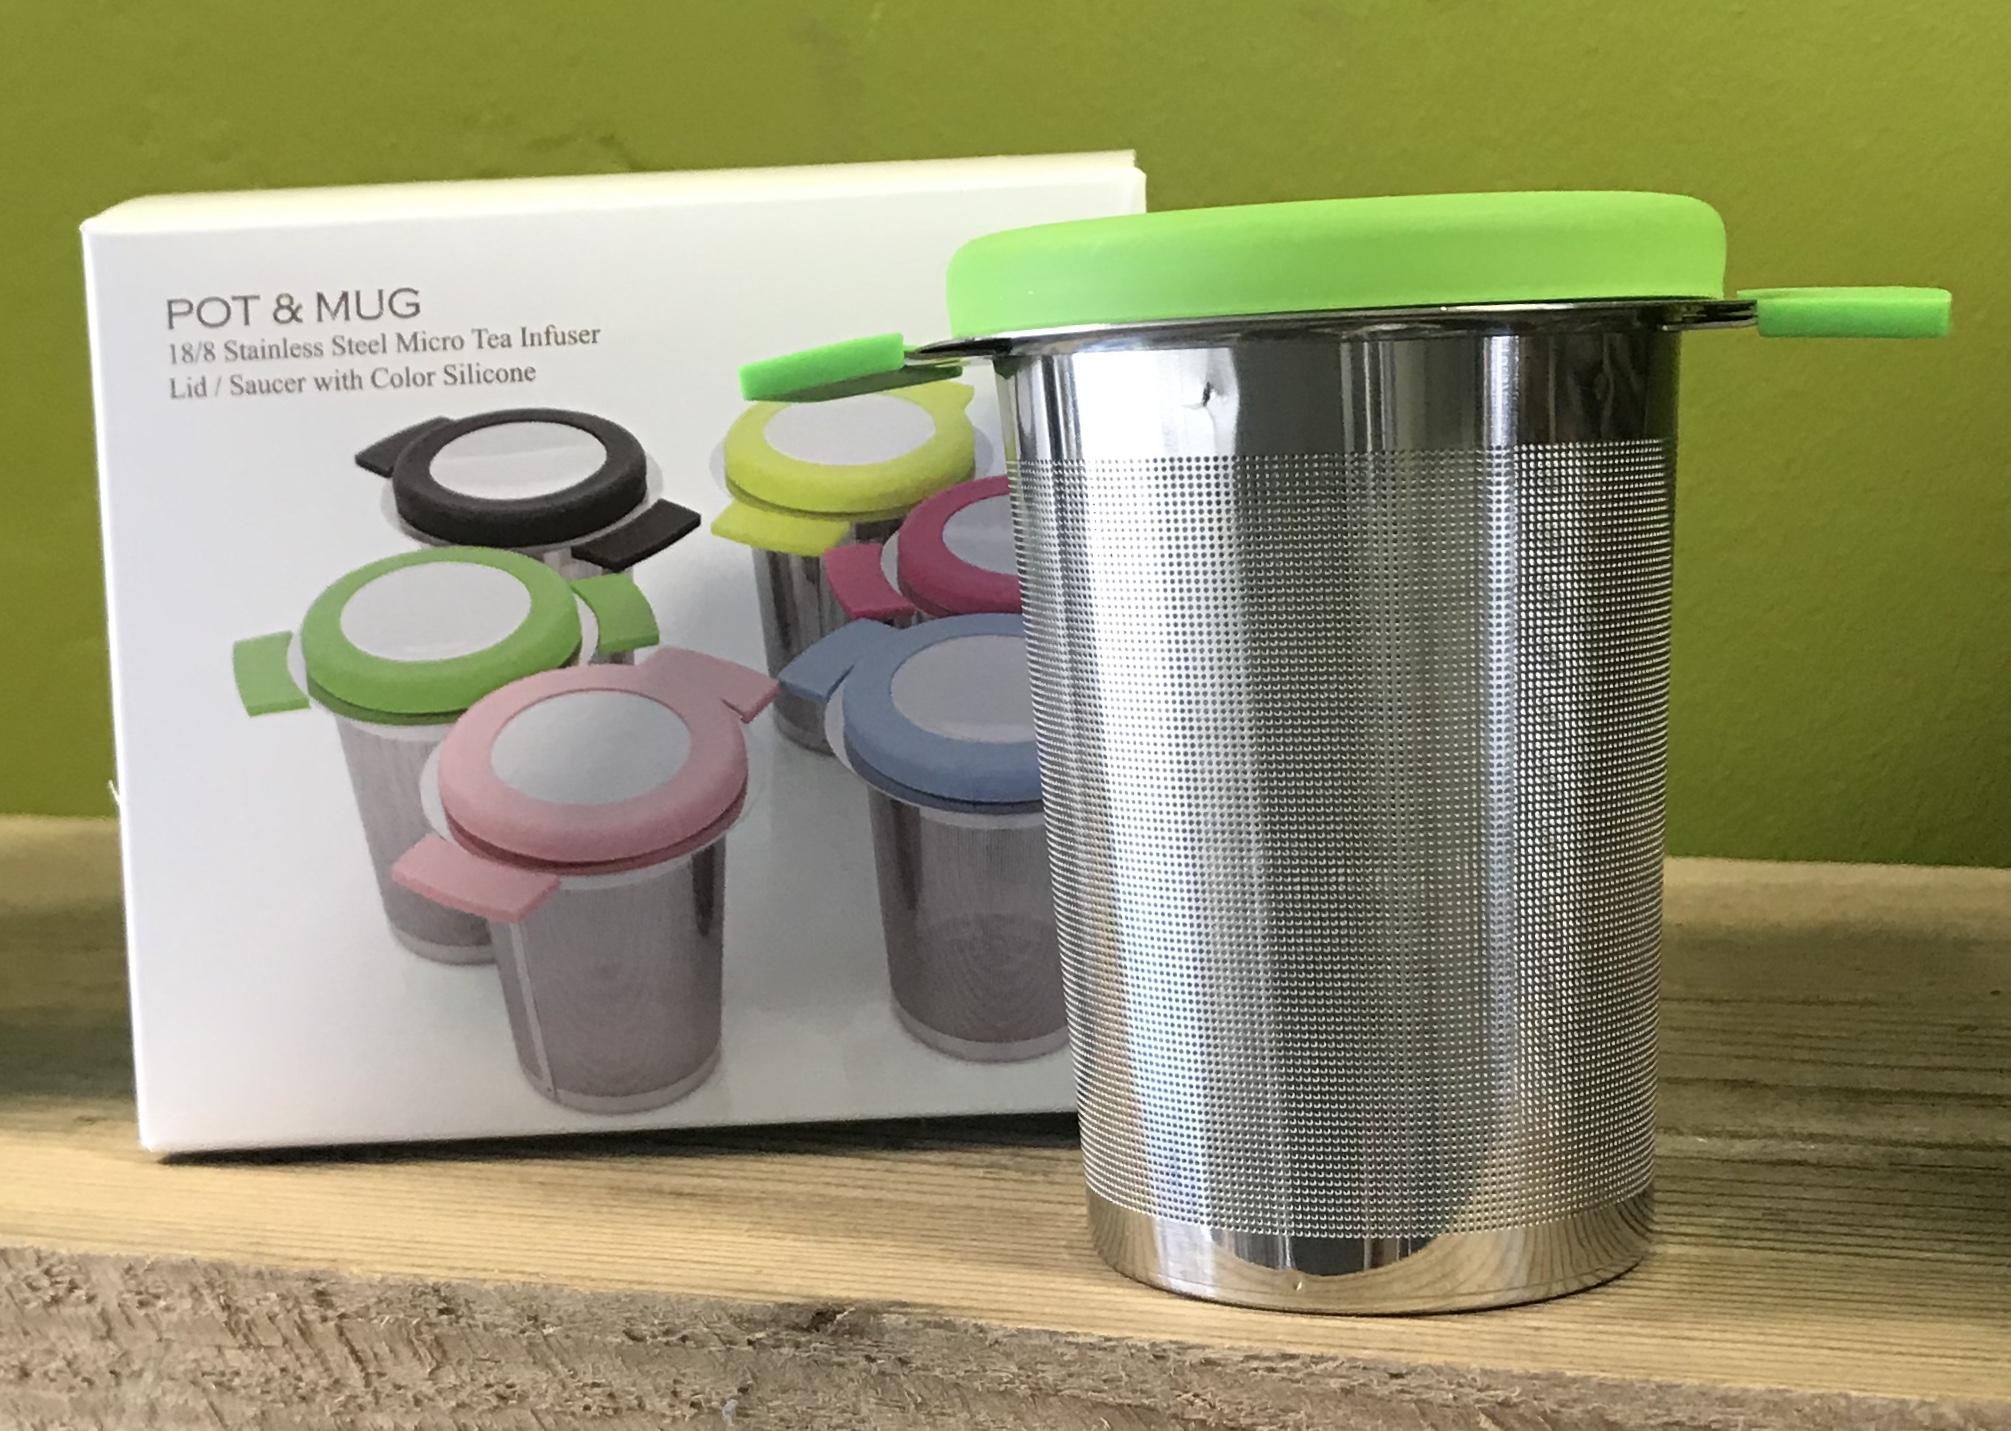 Pot & Mug Micro Tea Infuser